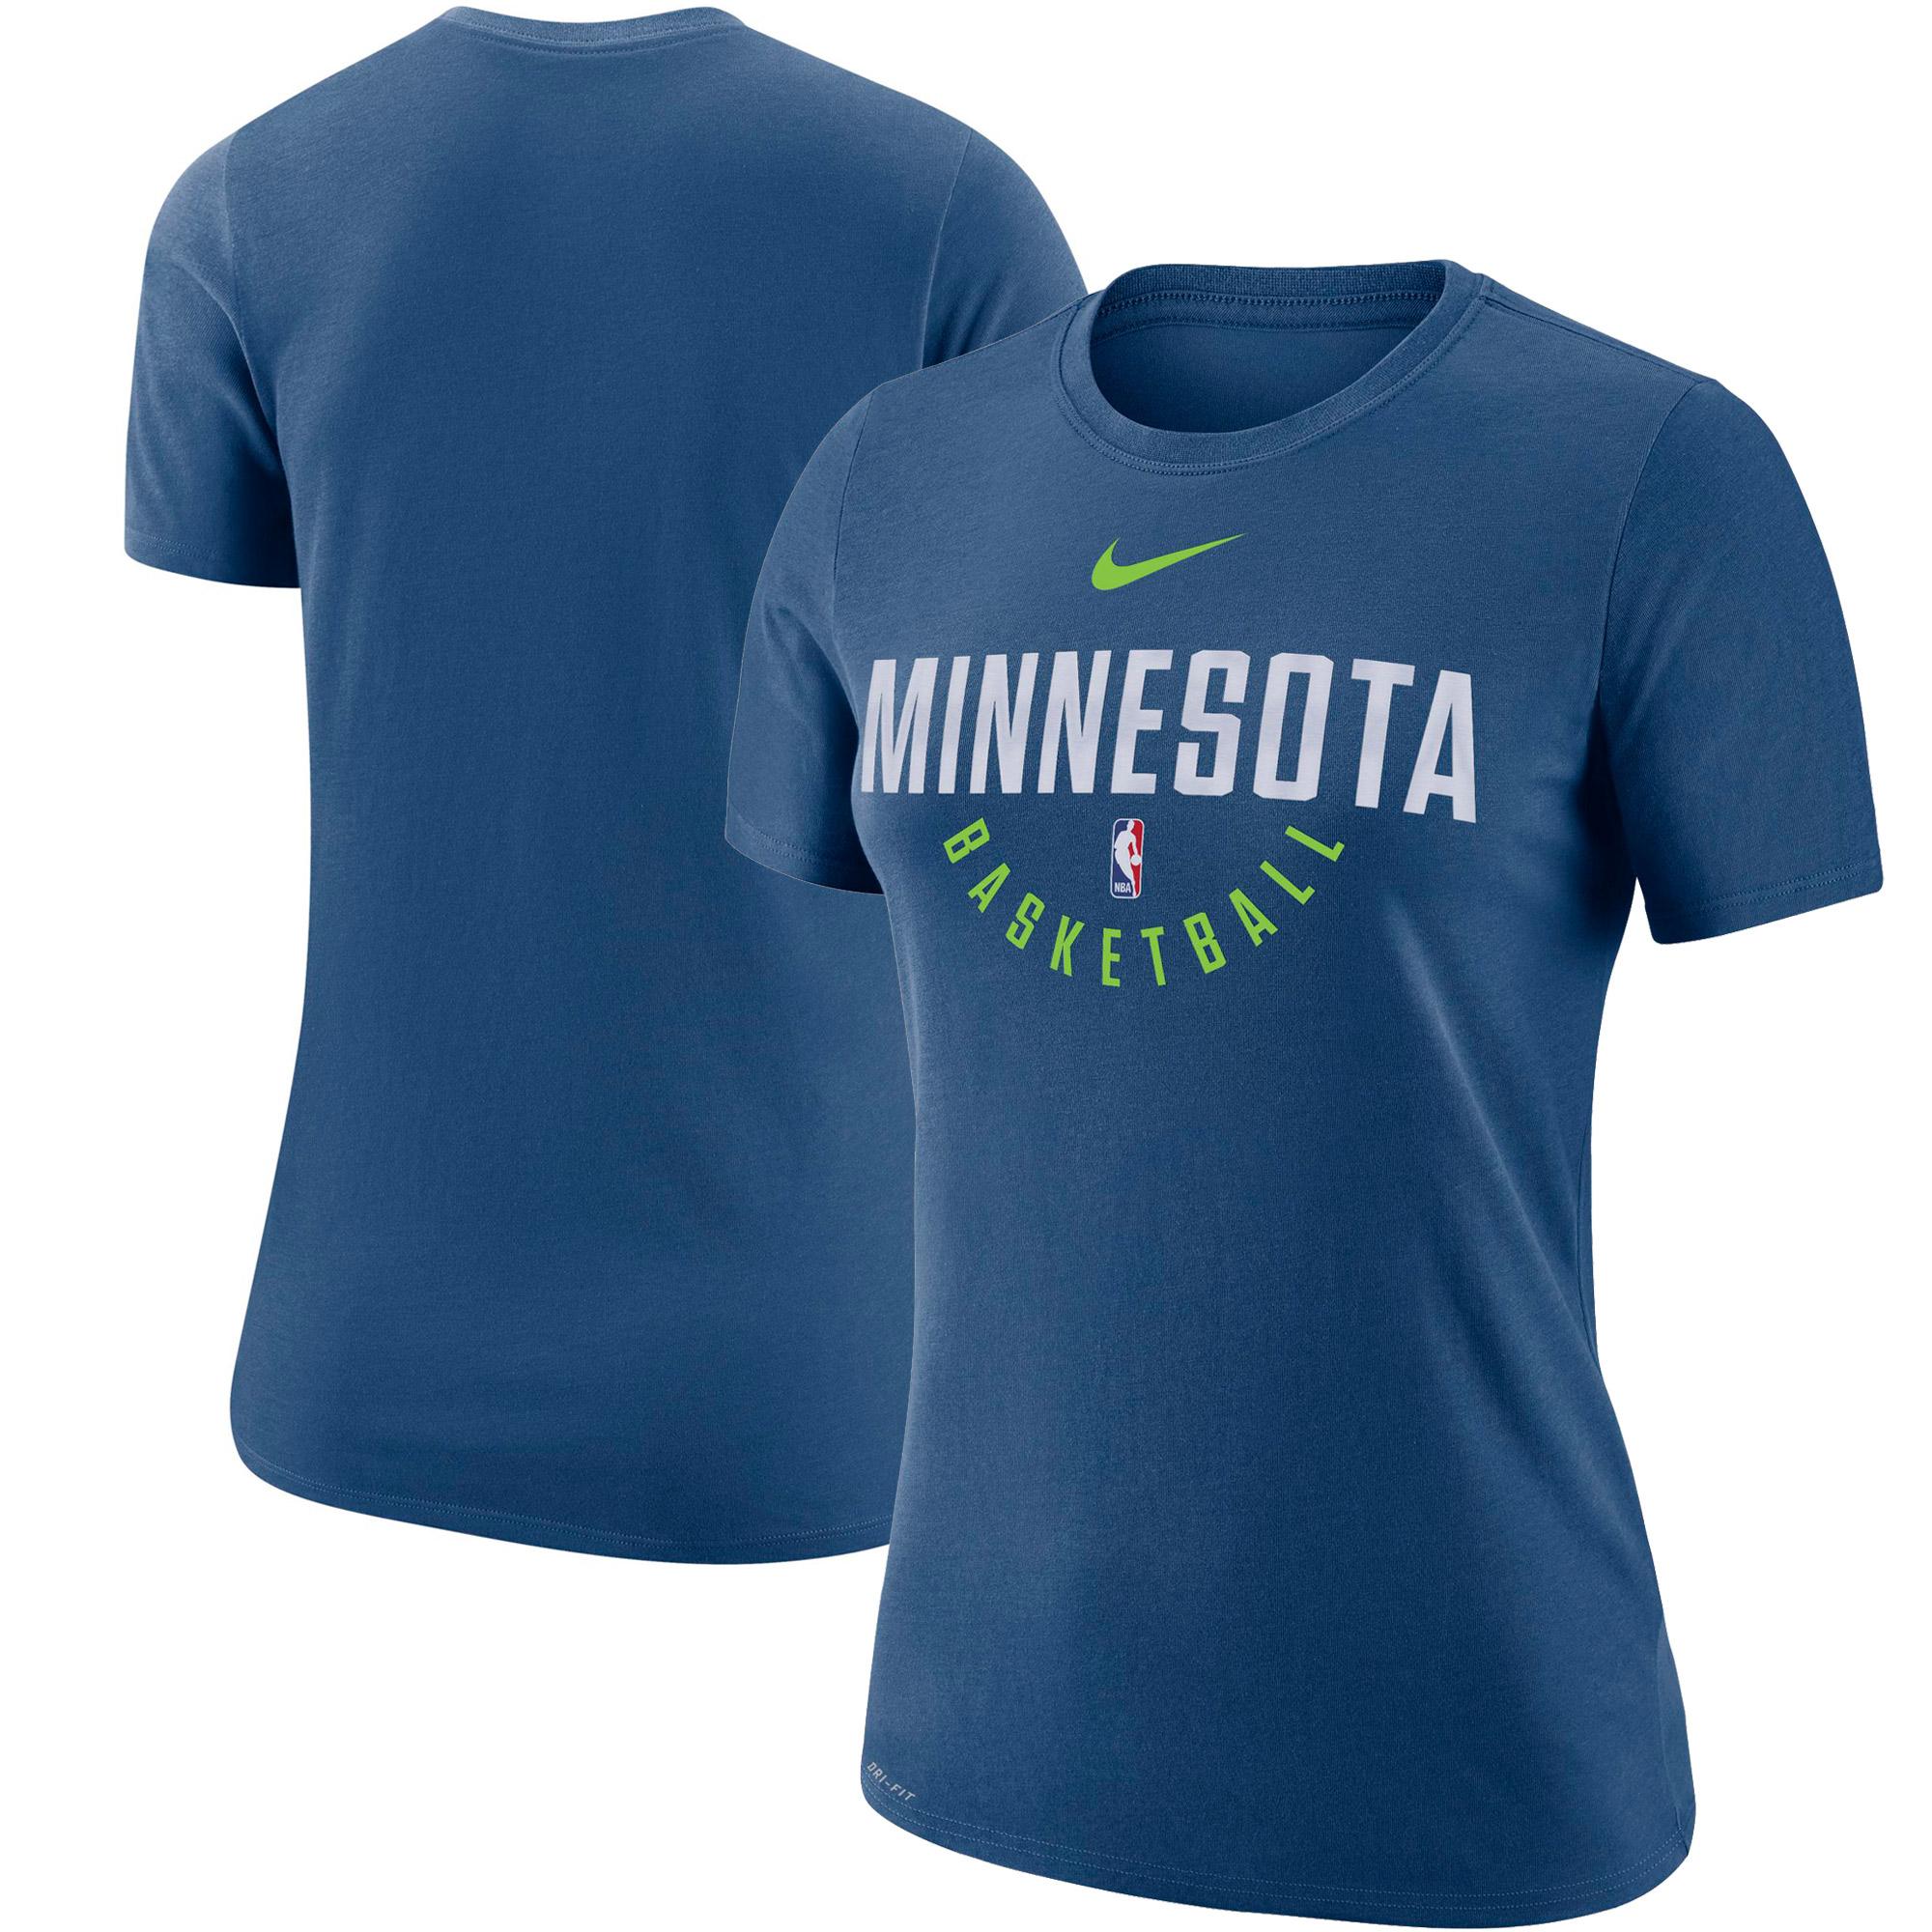 Minnesota Timberwolves Nike Women's Practice Performance T-Shirt - Blue